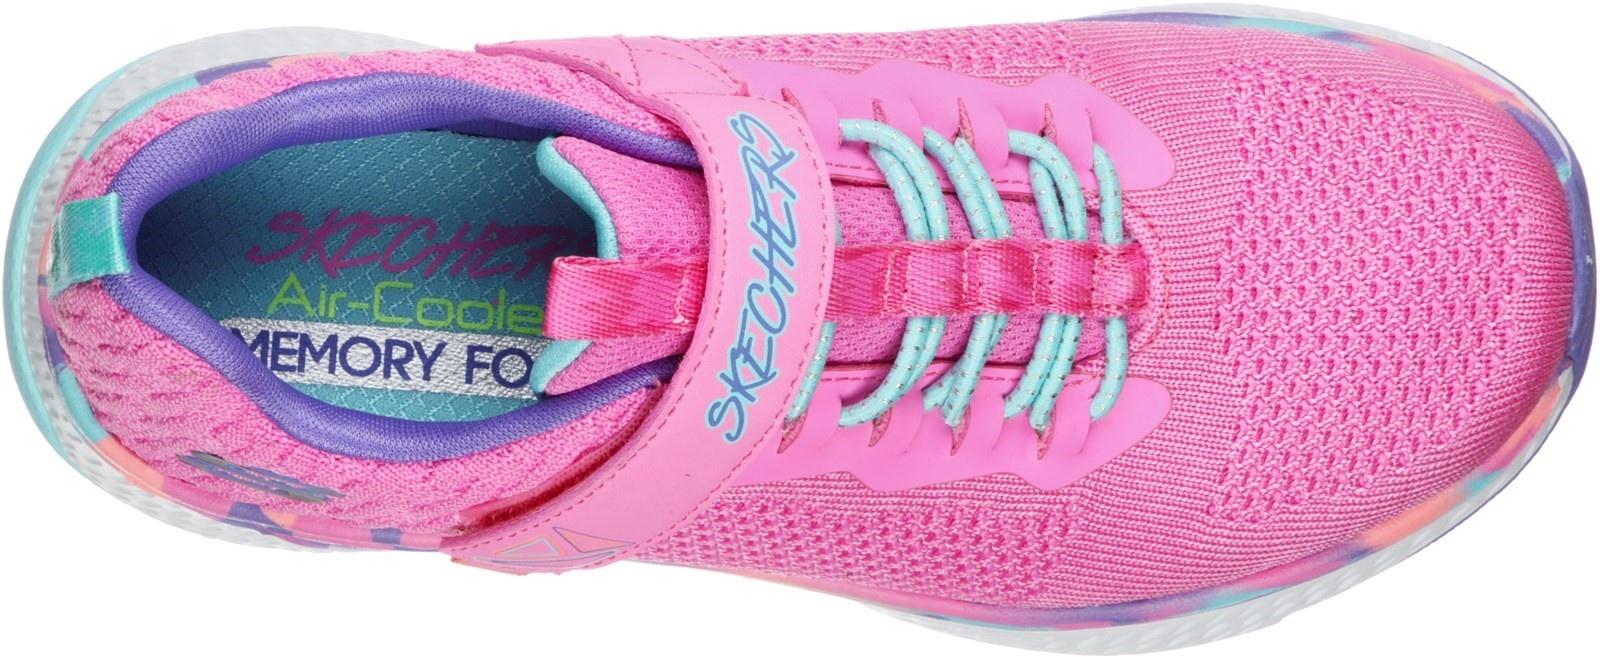 Skechers Paint Power Pink Multi